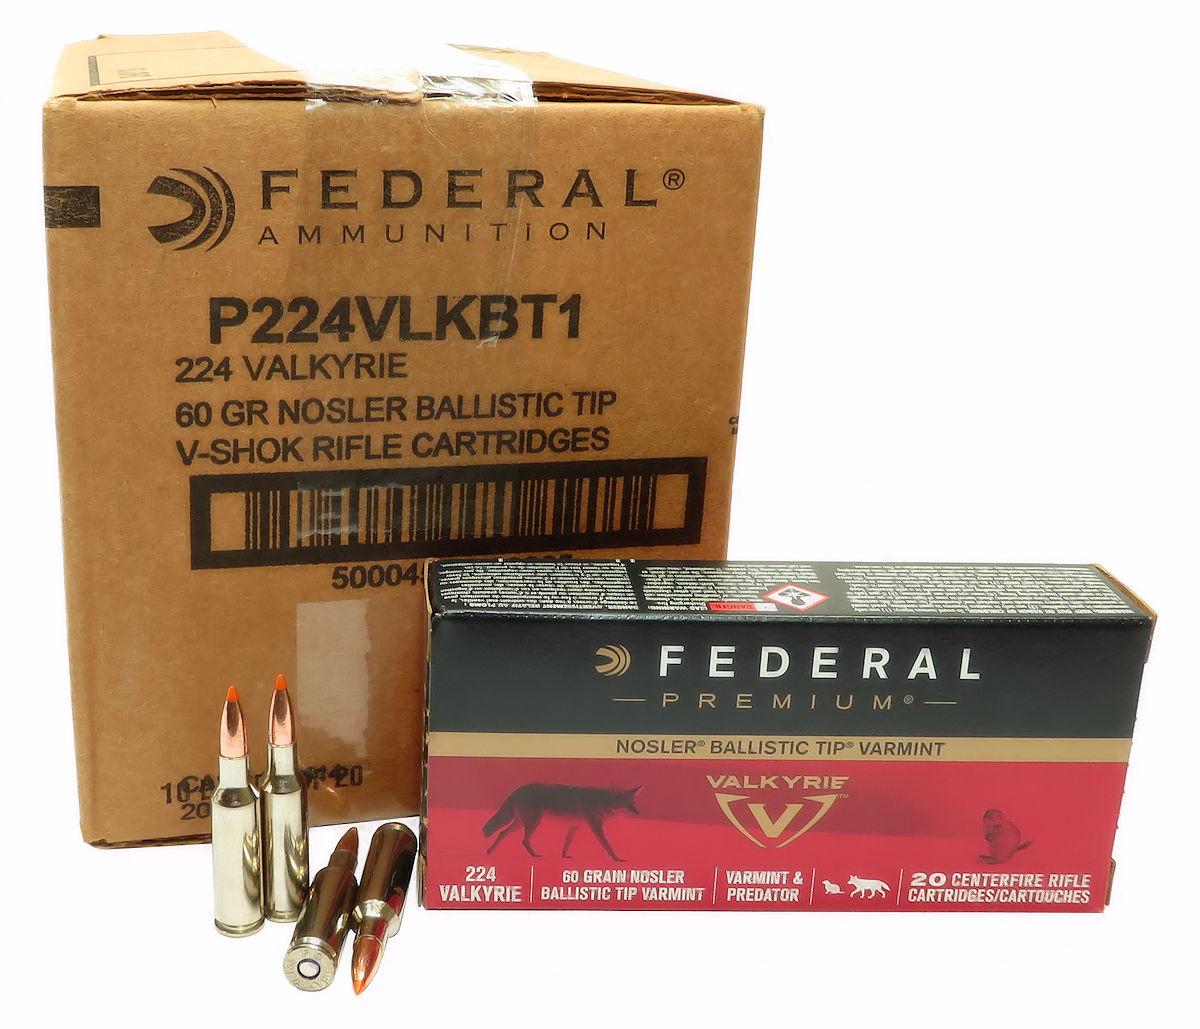 224 Valkyrie Ammo 60gr Nosler Ballistic Tip Federal (P224VLKBT1) 200 Round  Case